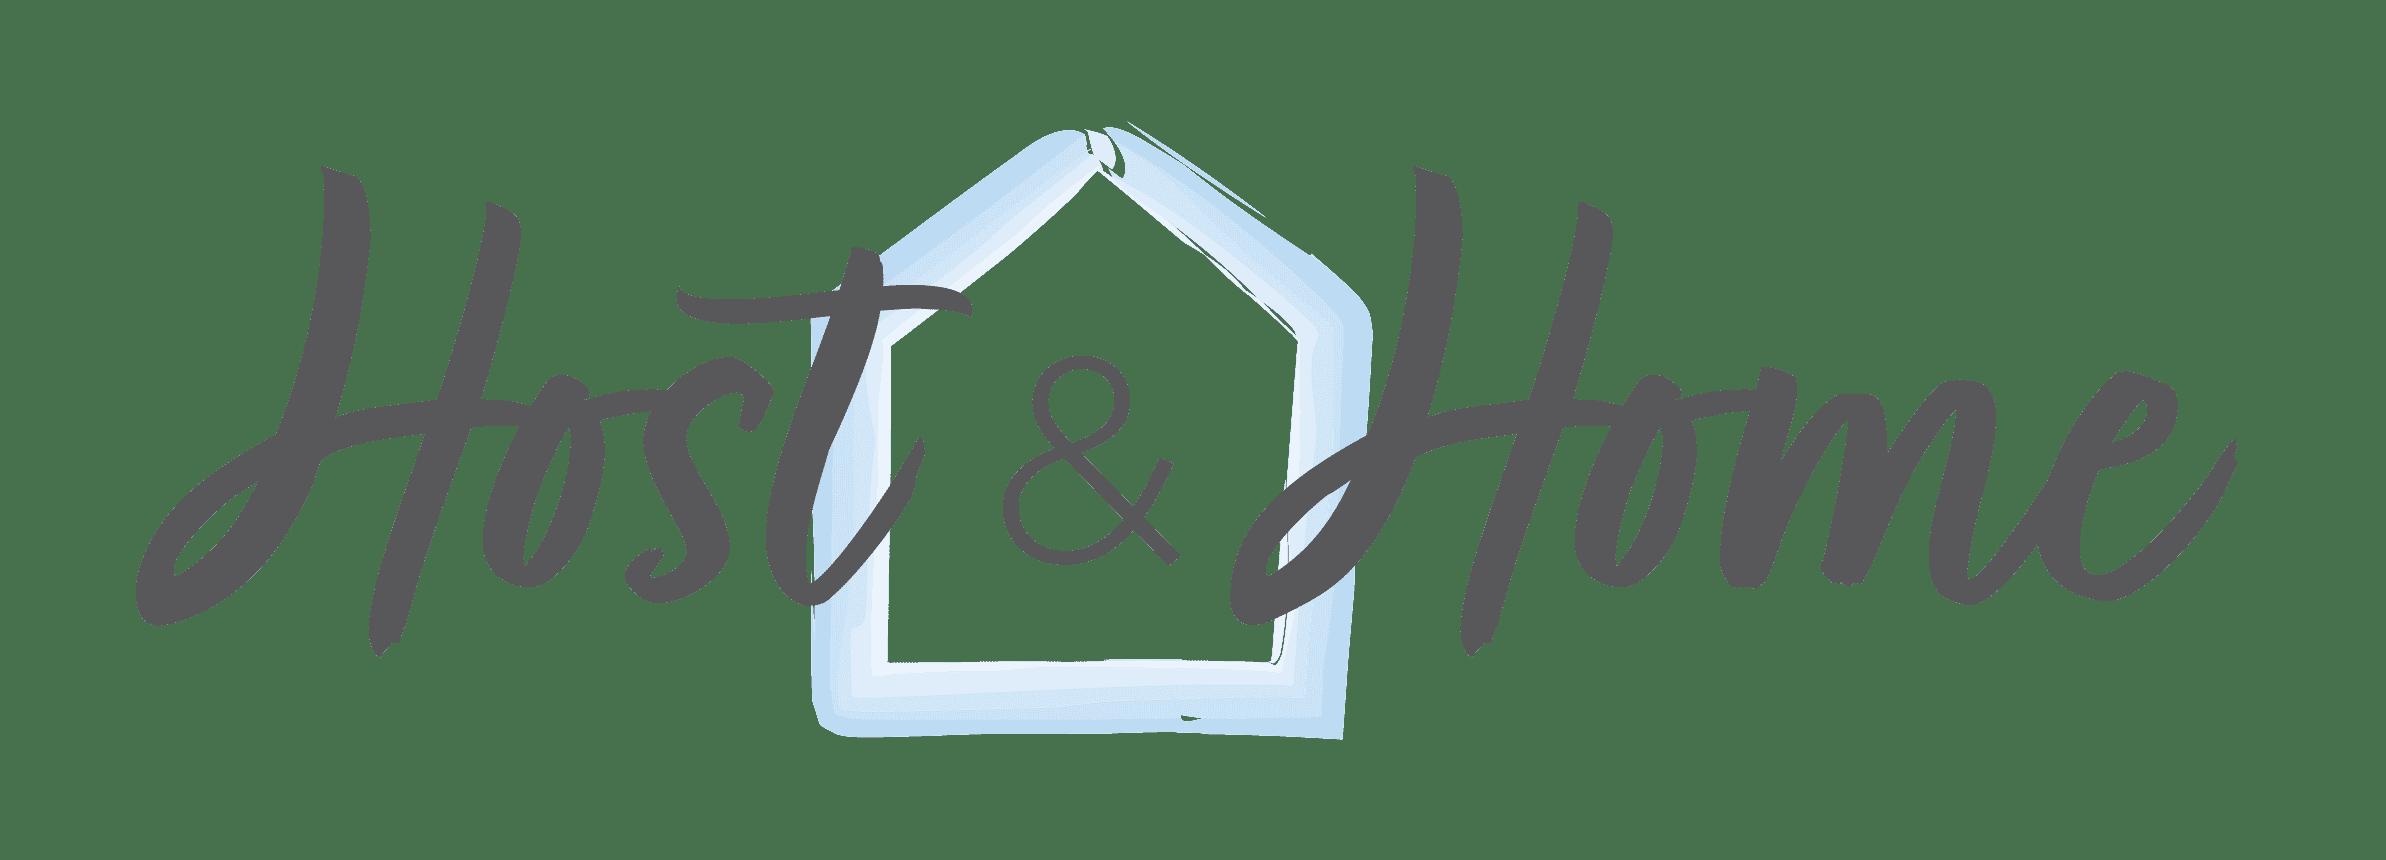 Host & Home